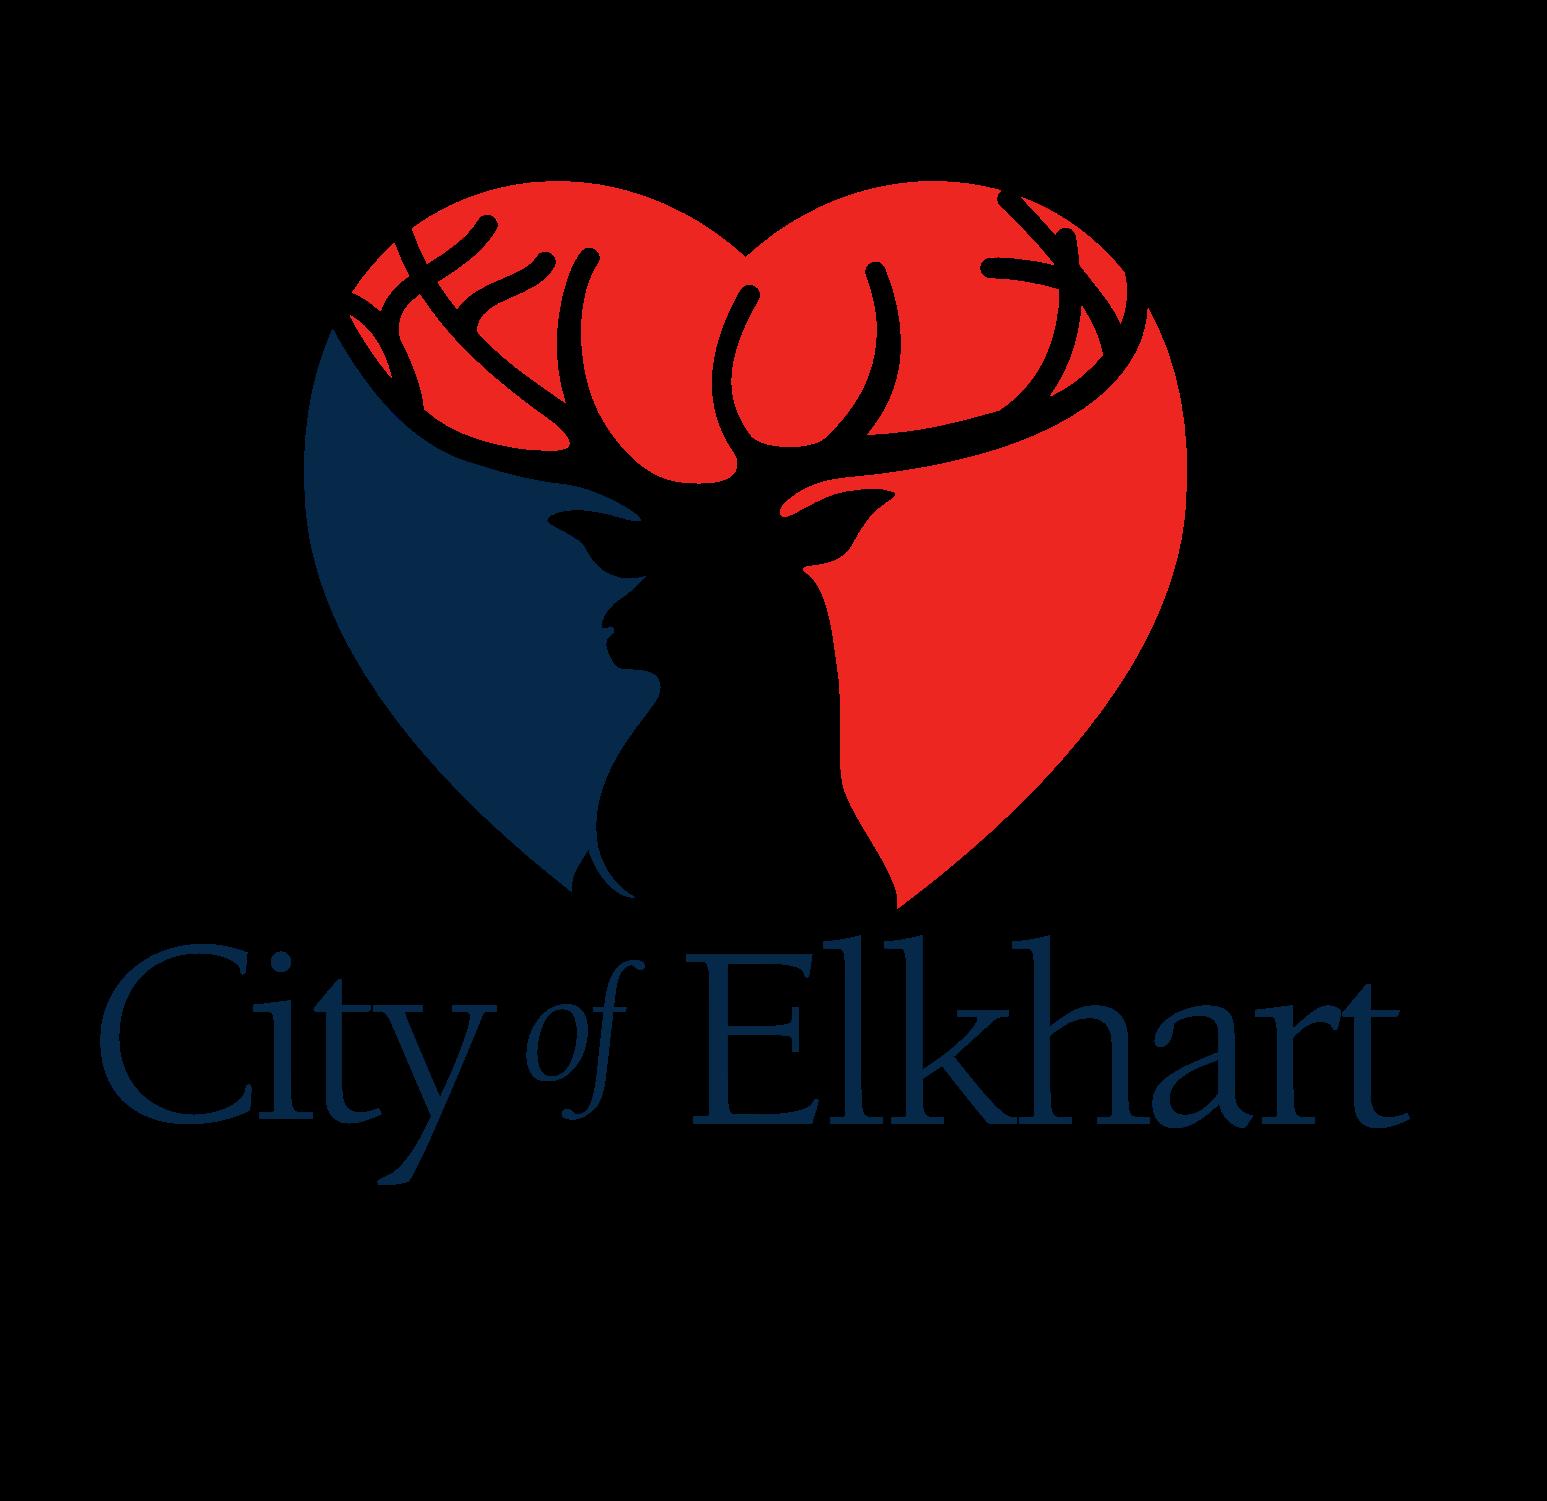 City of Elkhart, Indiana